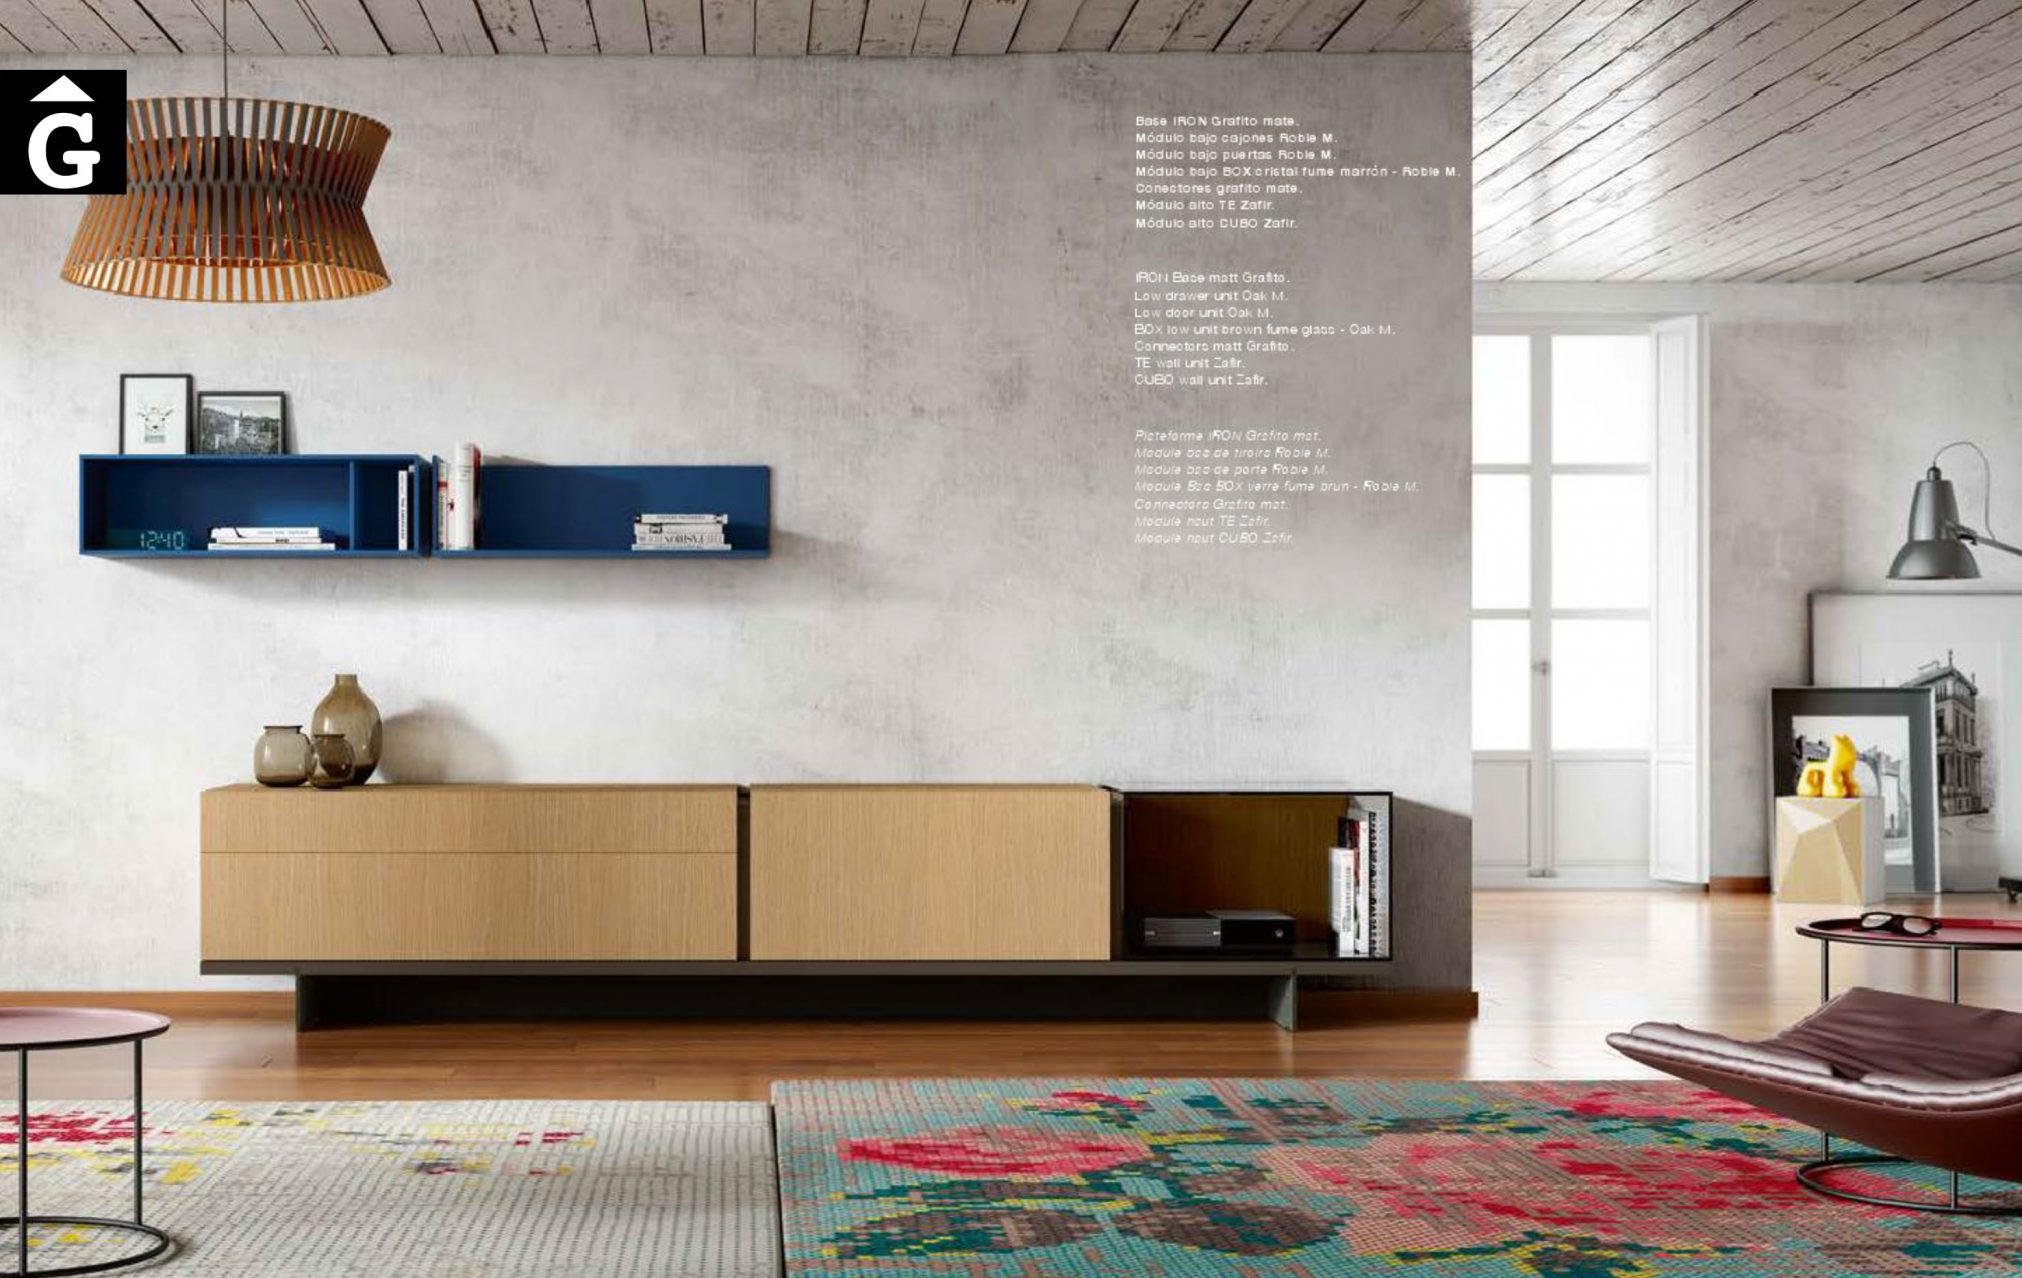 MOBLE-44-CONNECTOR-EMEDE-mobles-by-Mobles-GIFREU-Girona-ESPAI-EMEDE-Epacio-emede-Muebles-MD-moble-menjador-Sala-estar-habitatge-qualitat-laca-xapa-natural